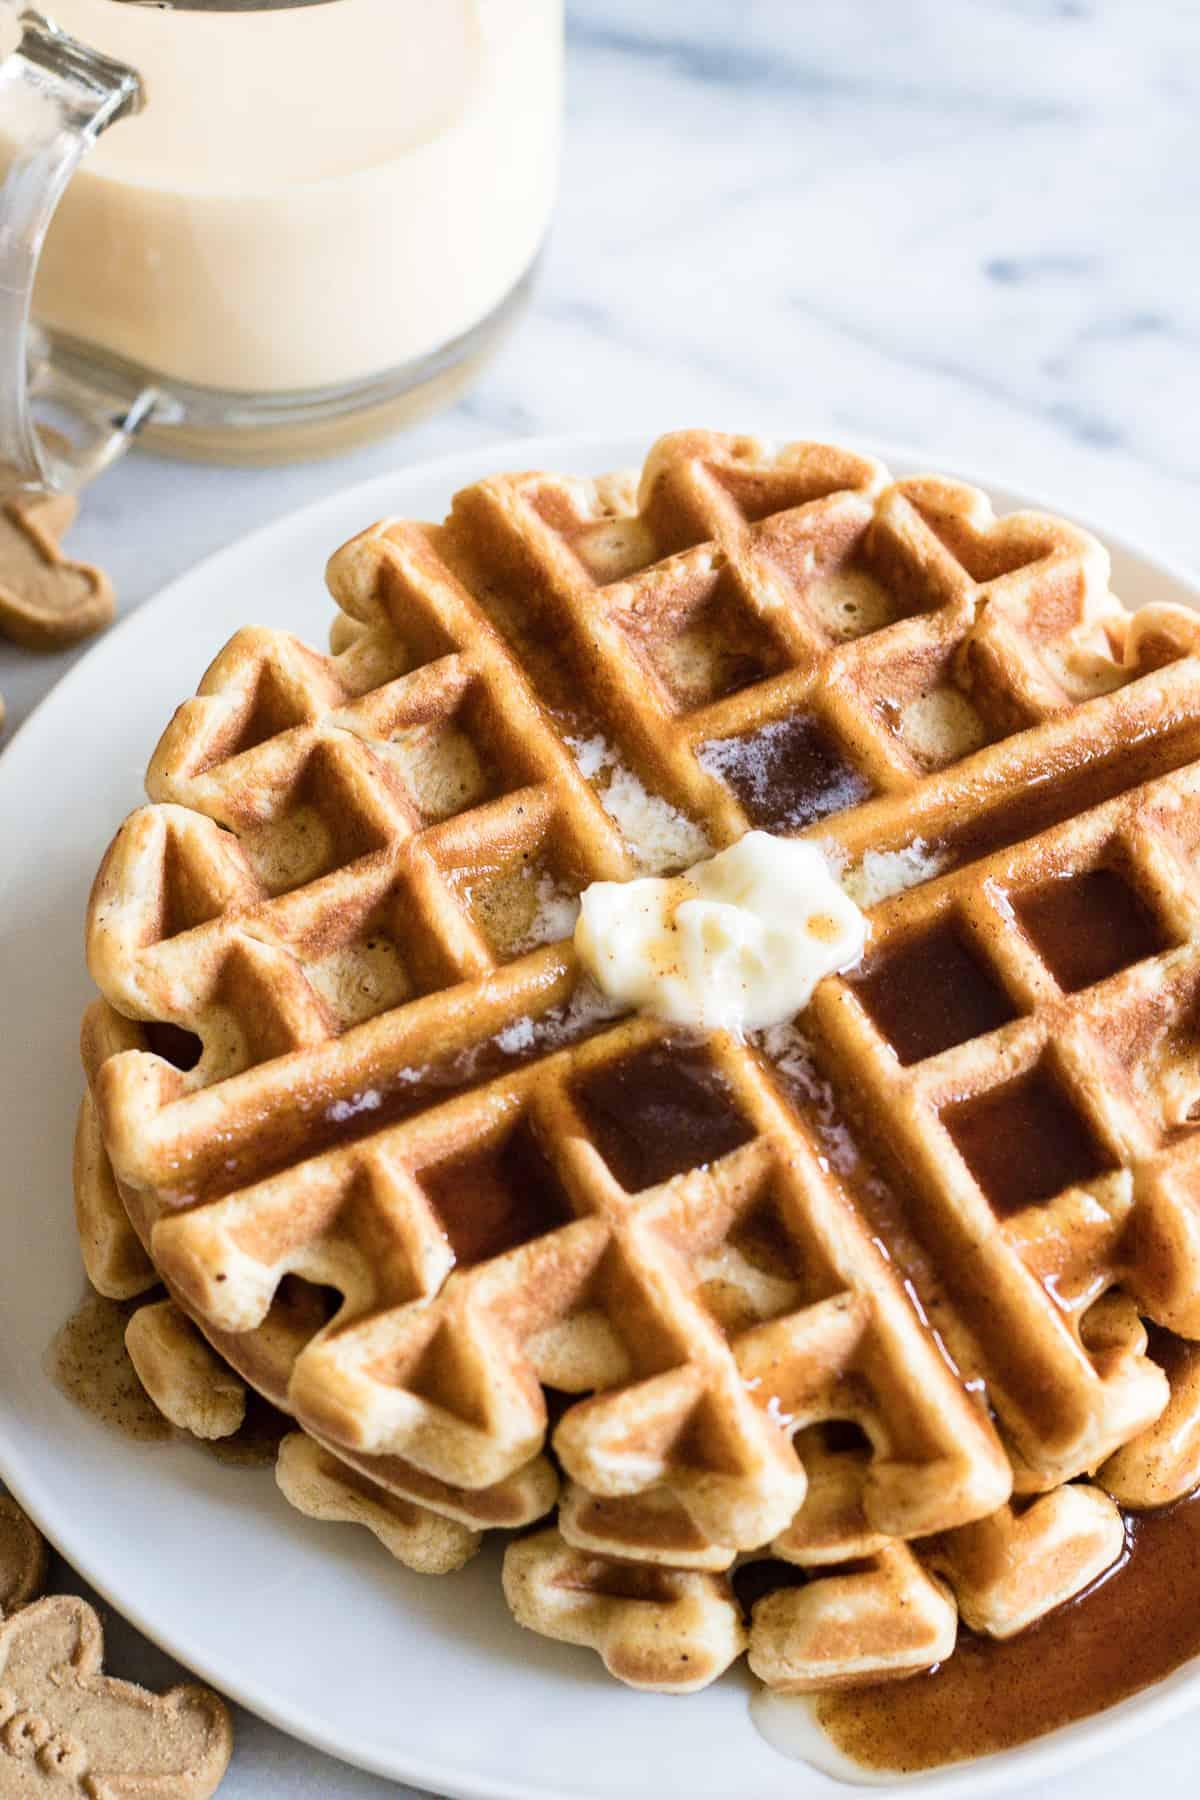 Eggnog Waffles With Cinnamon Syrup